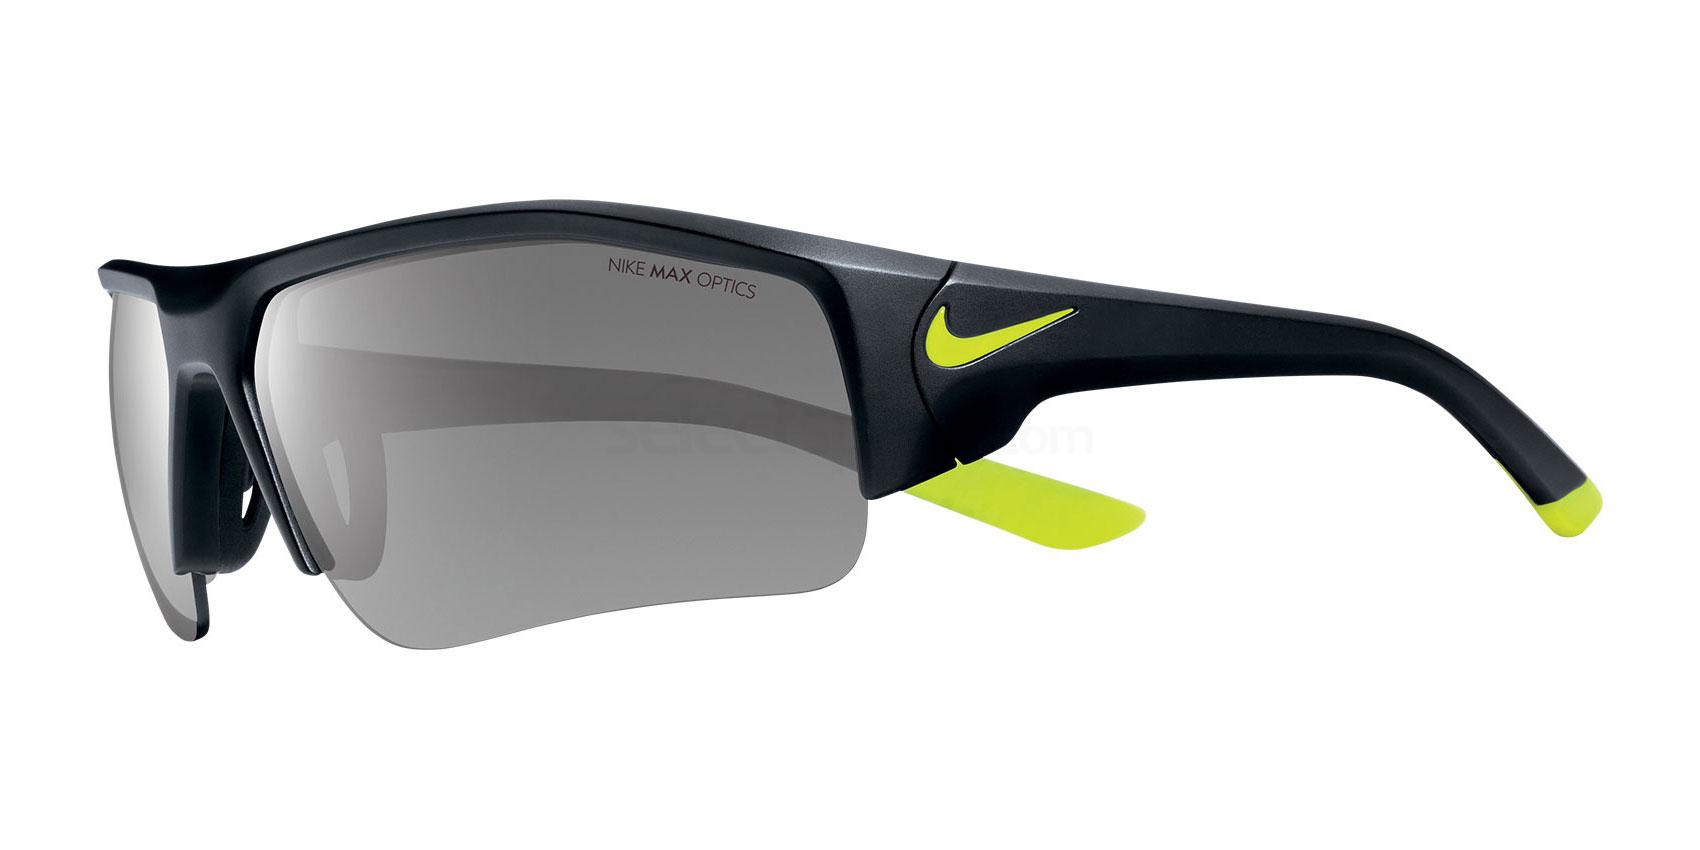 007 SKYLON ACE XV JR EV0900 Sunglasses, Nike TEENS